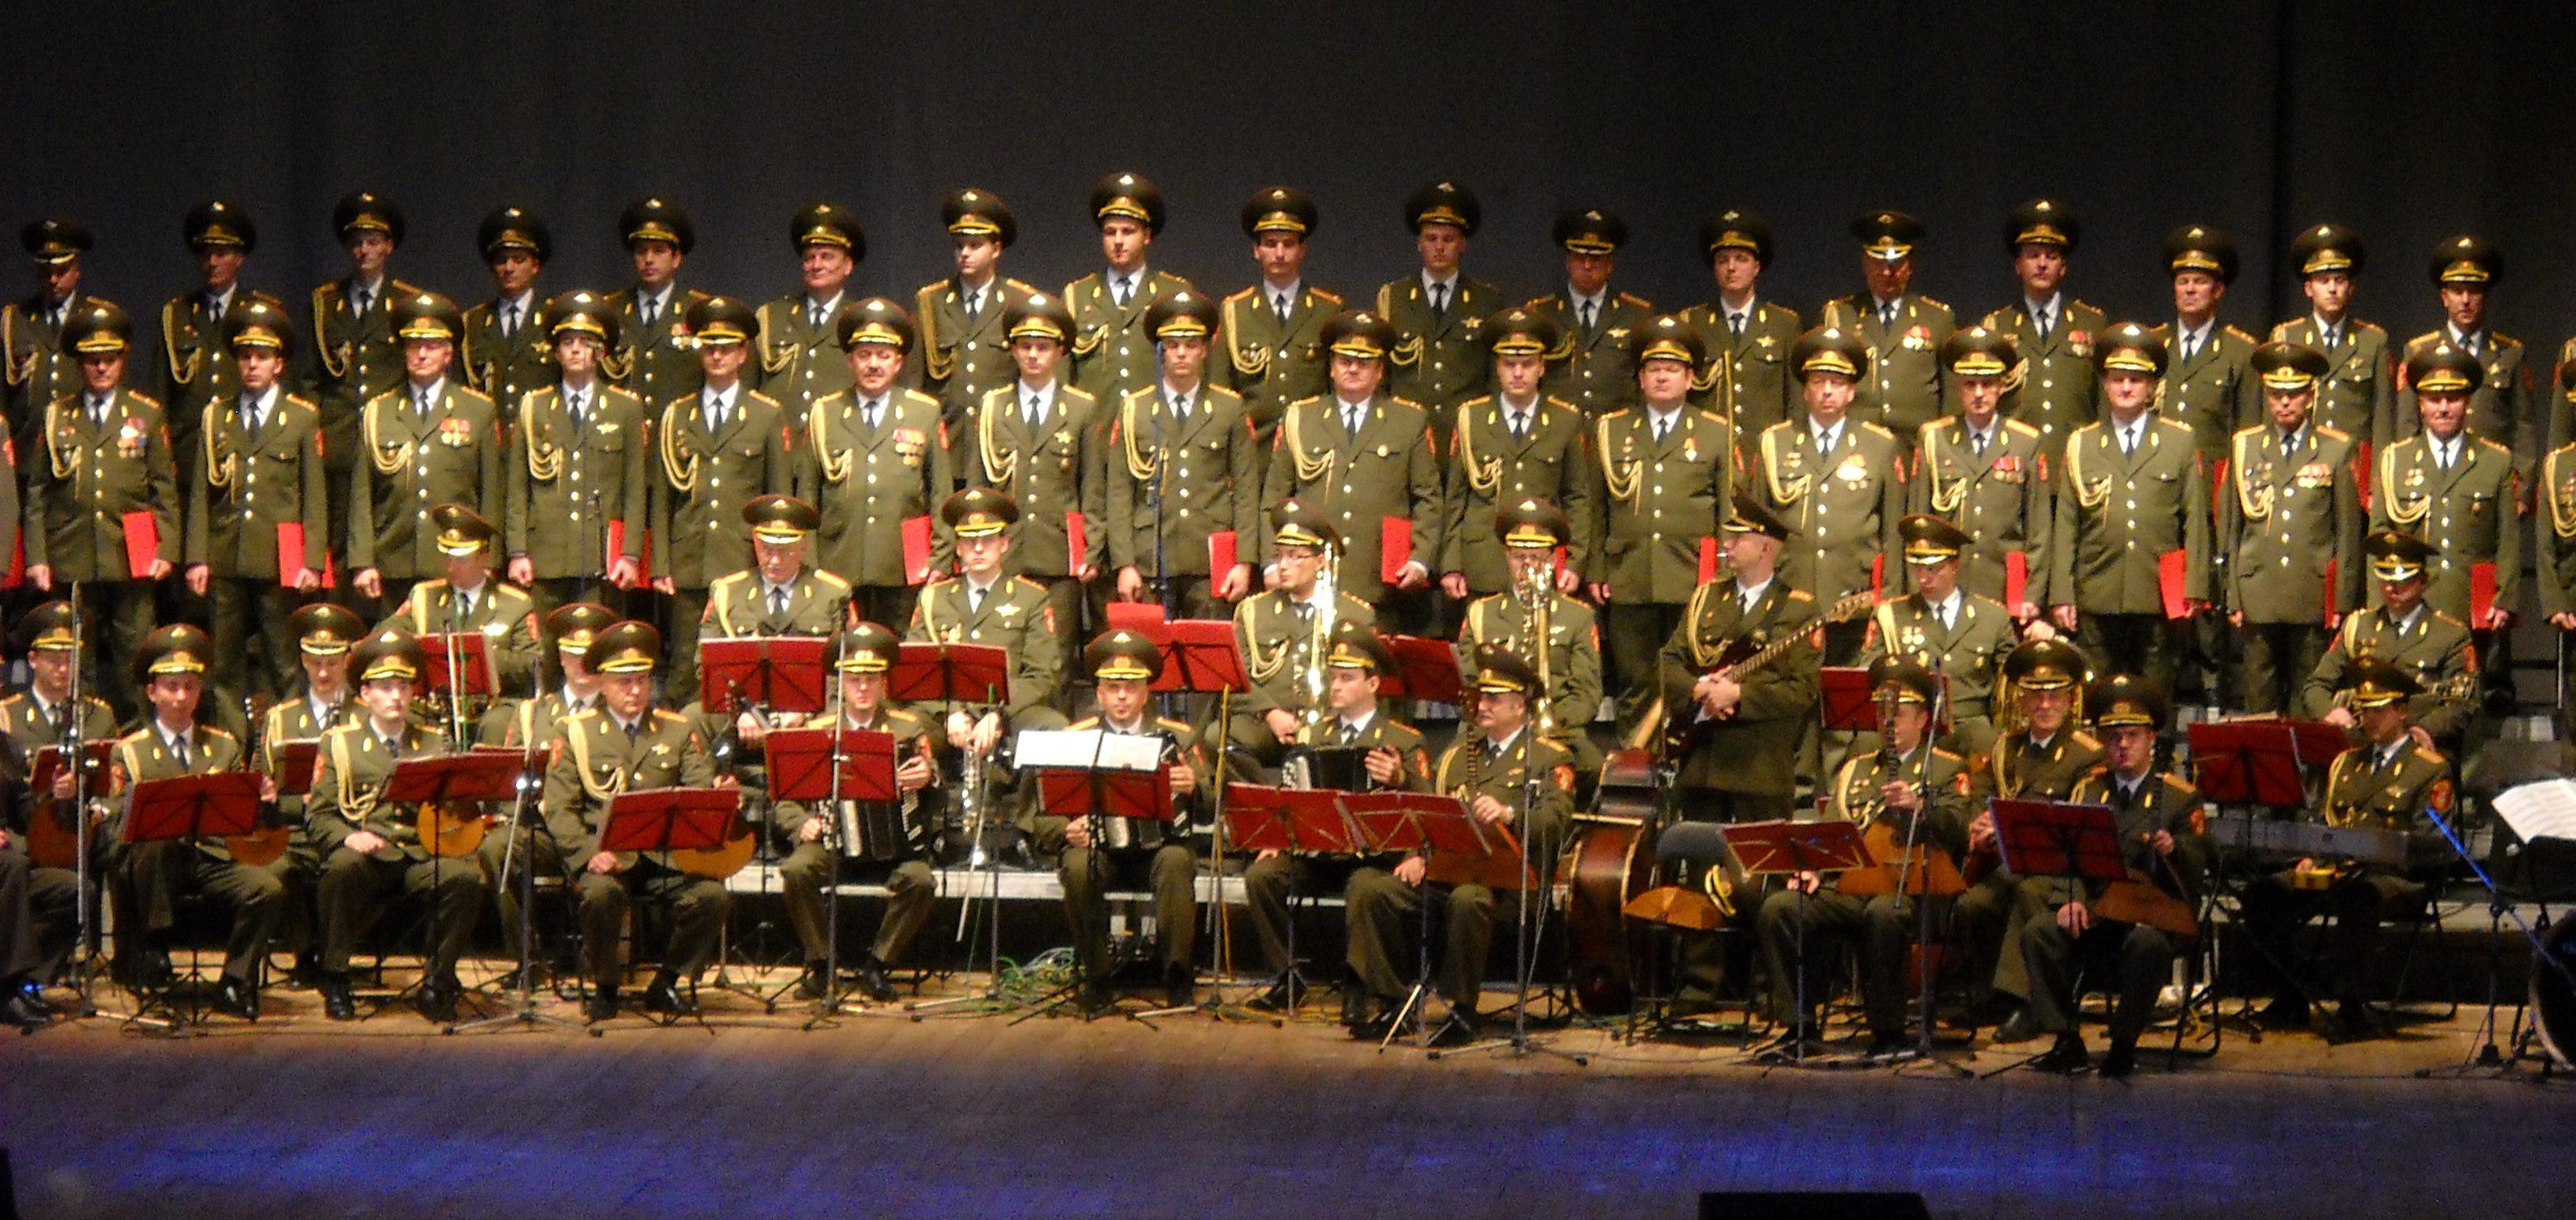 Alexandrov Ensemble choir - Wikipedia